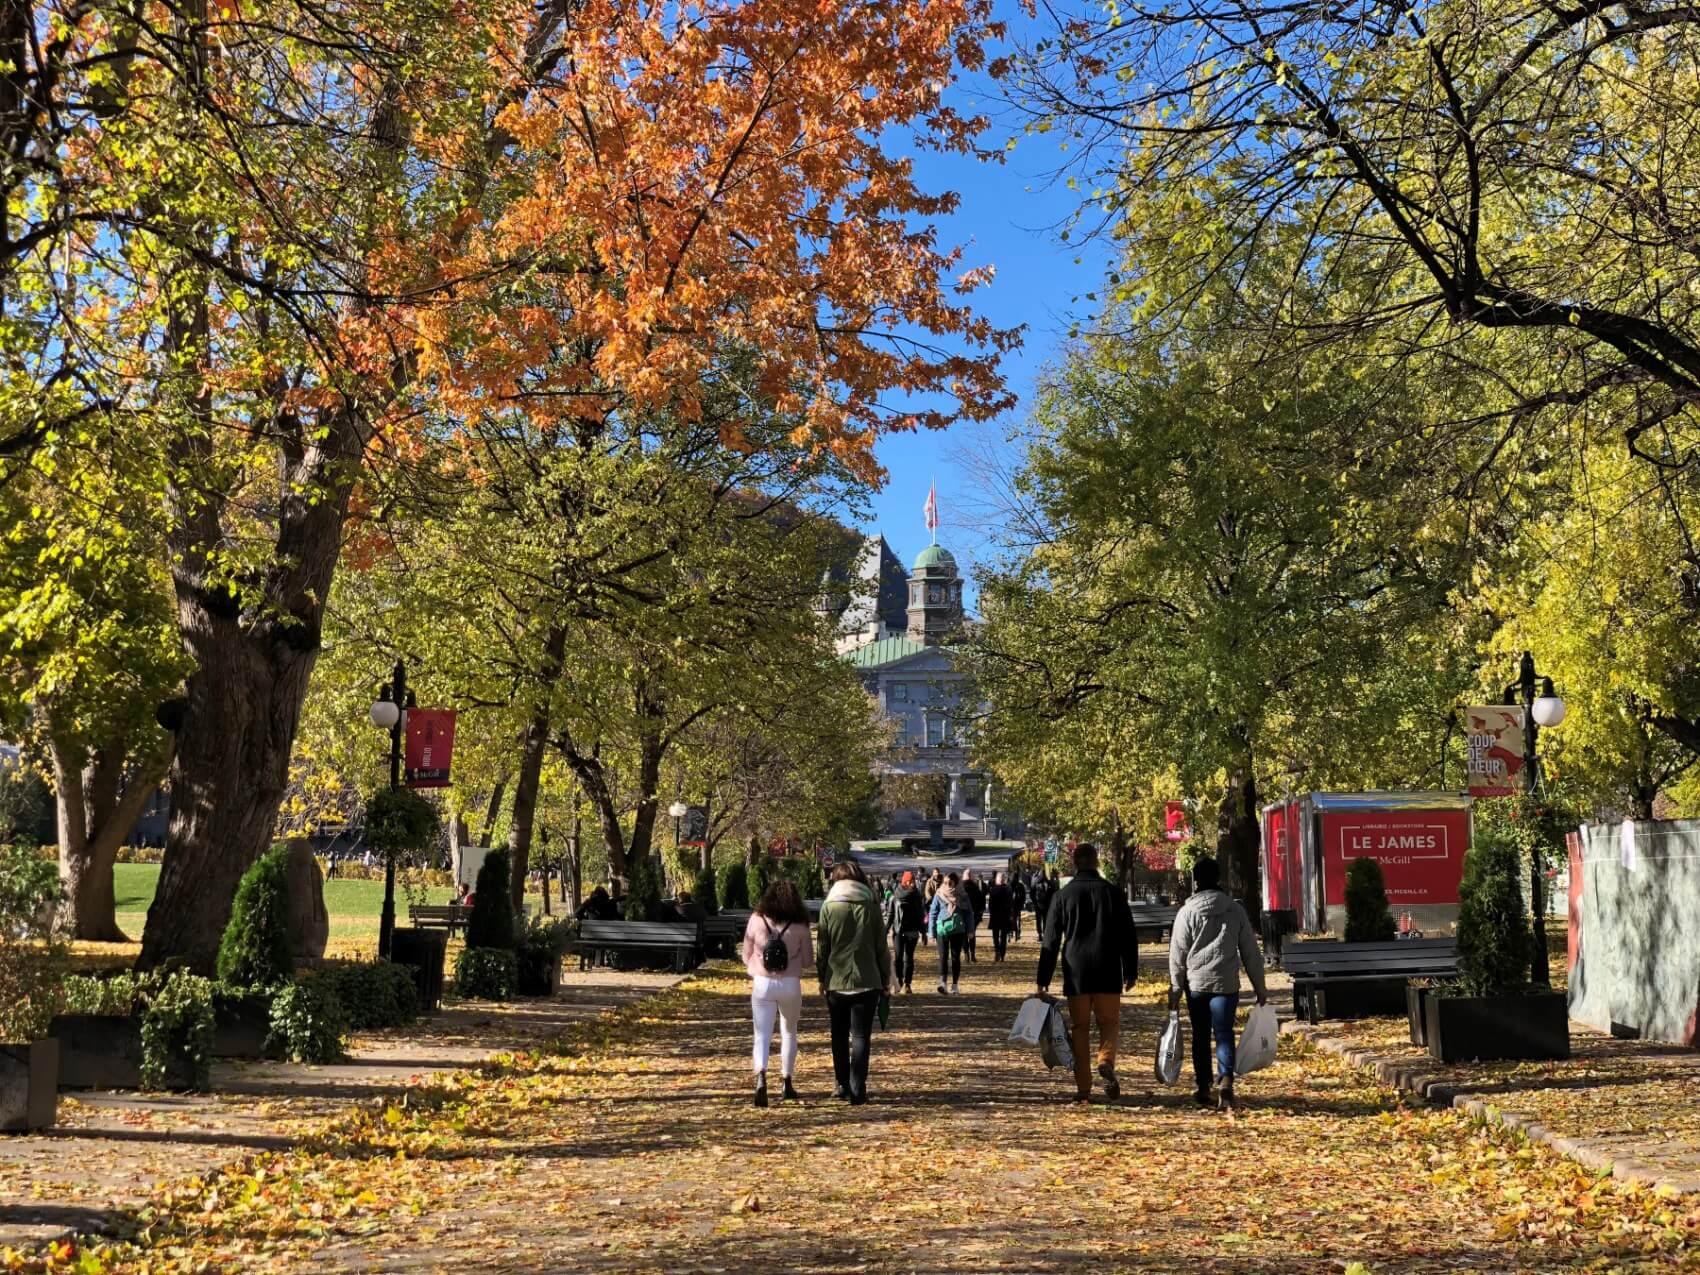 Canada reigns supreme as top study abroad destination: survey